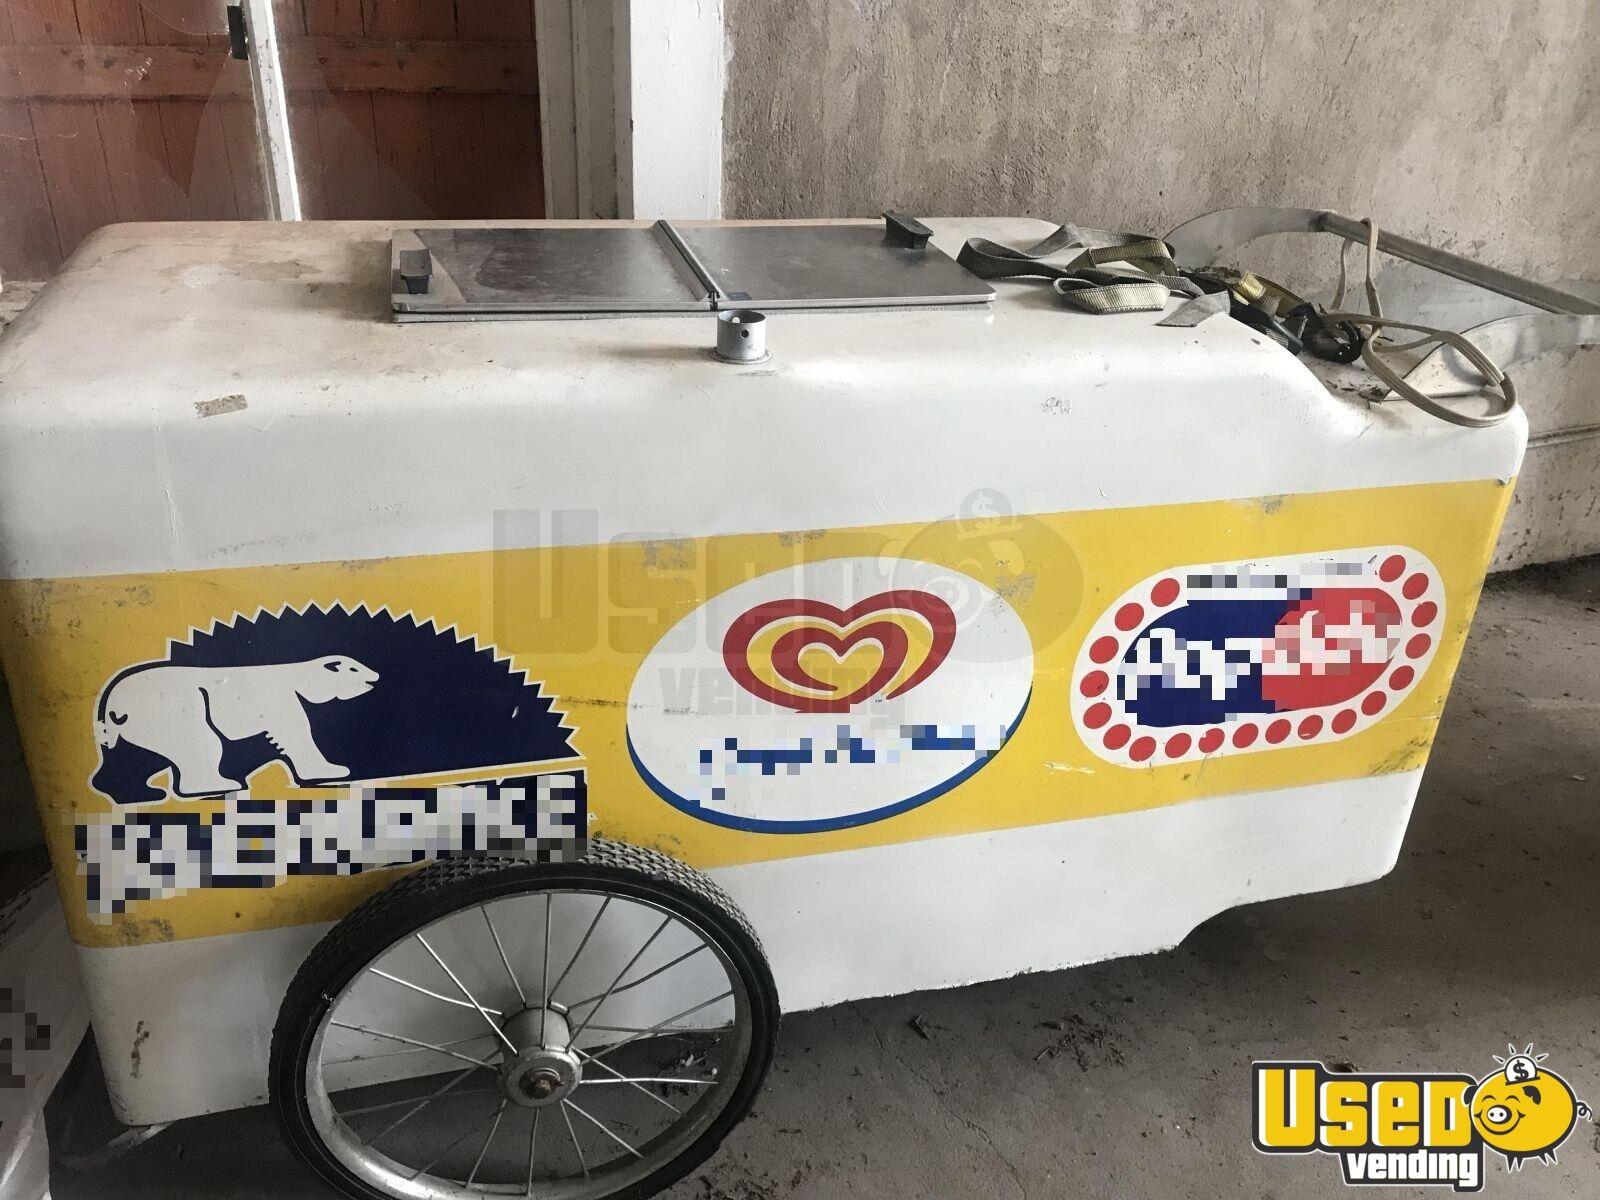 2 8 X 5 25 Ice Cream Vending Cart Used Vending Cart